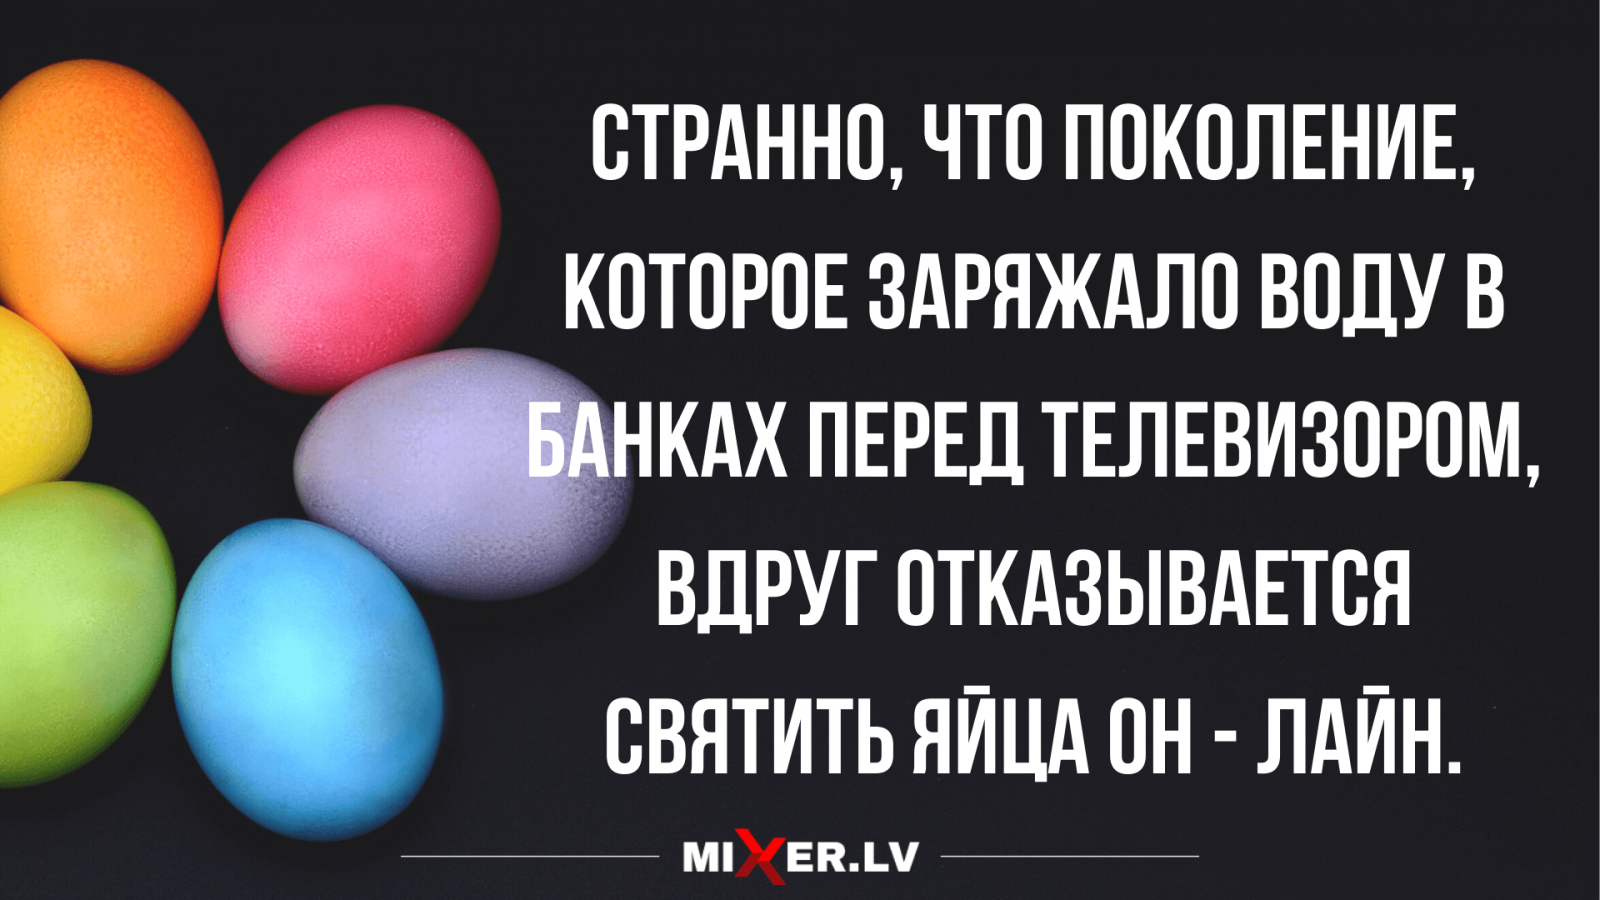 2020-04-18-mixnews-anekdoty-v-subbotu-i-pasha4.png